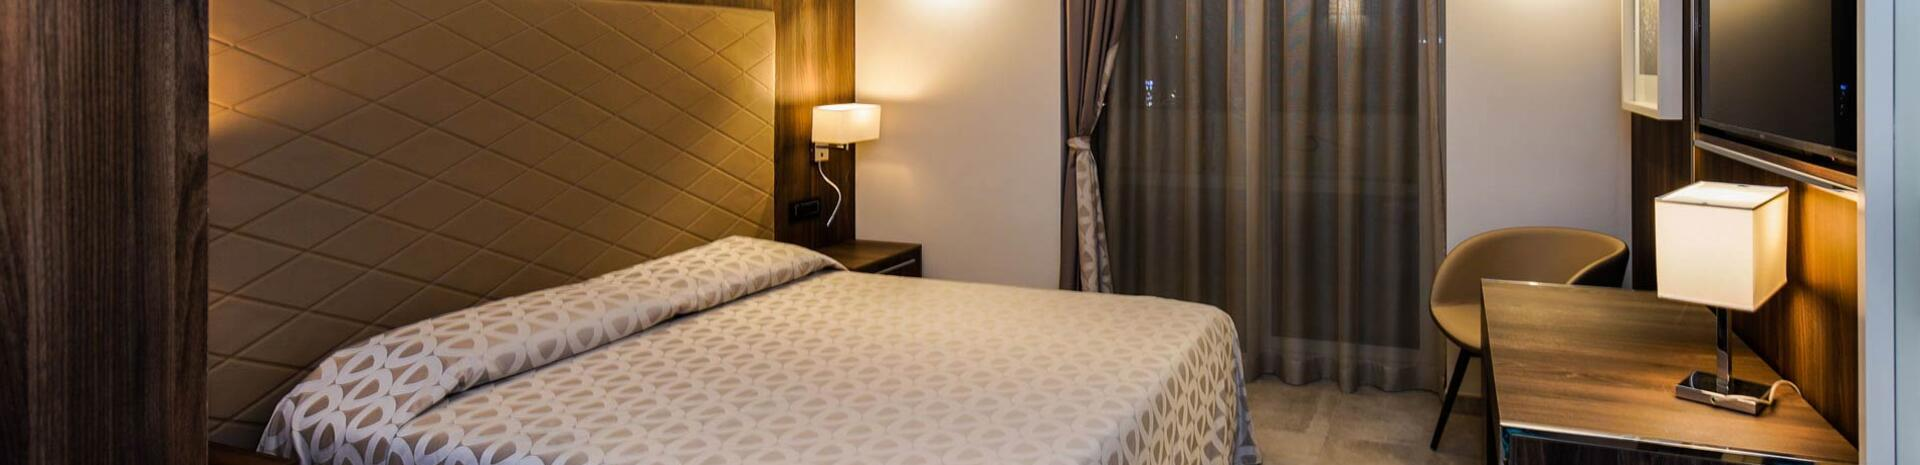 hotelkuma en rooms 003